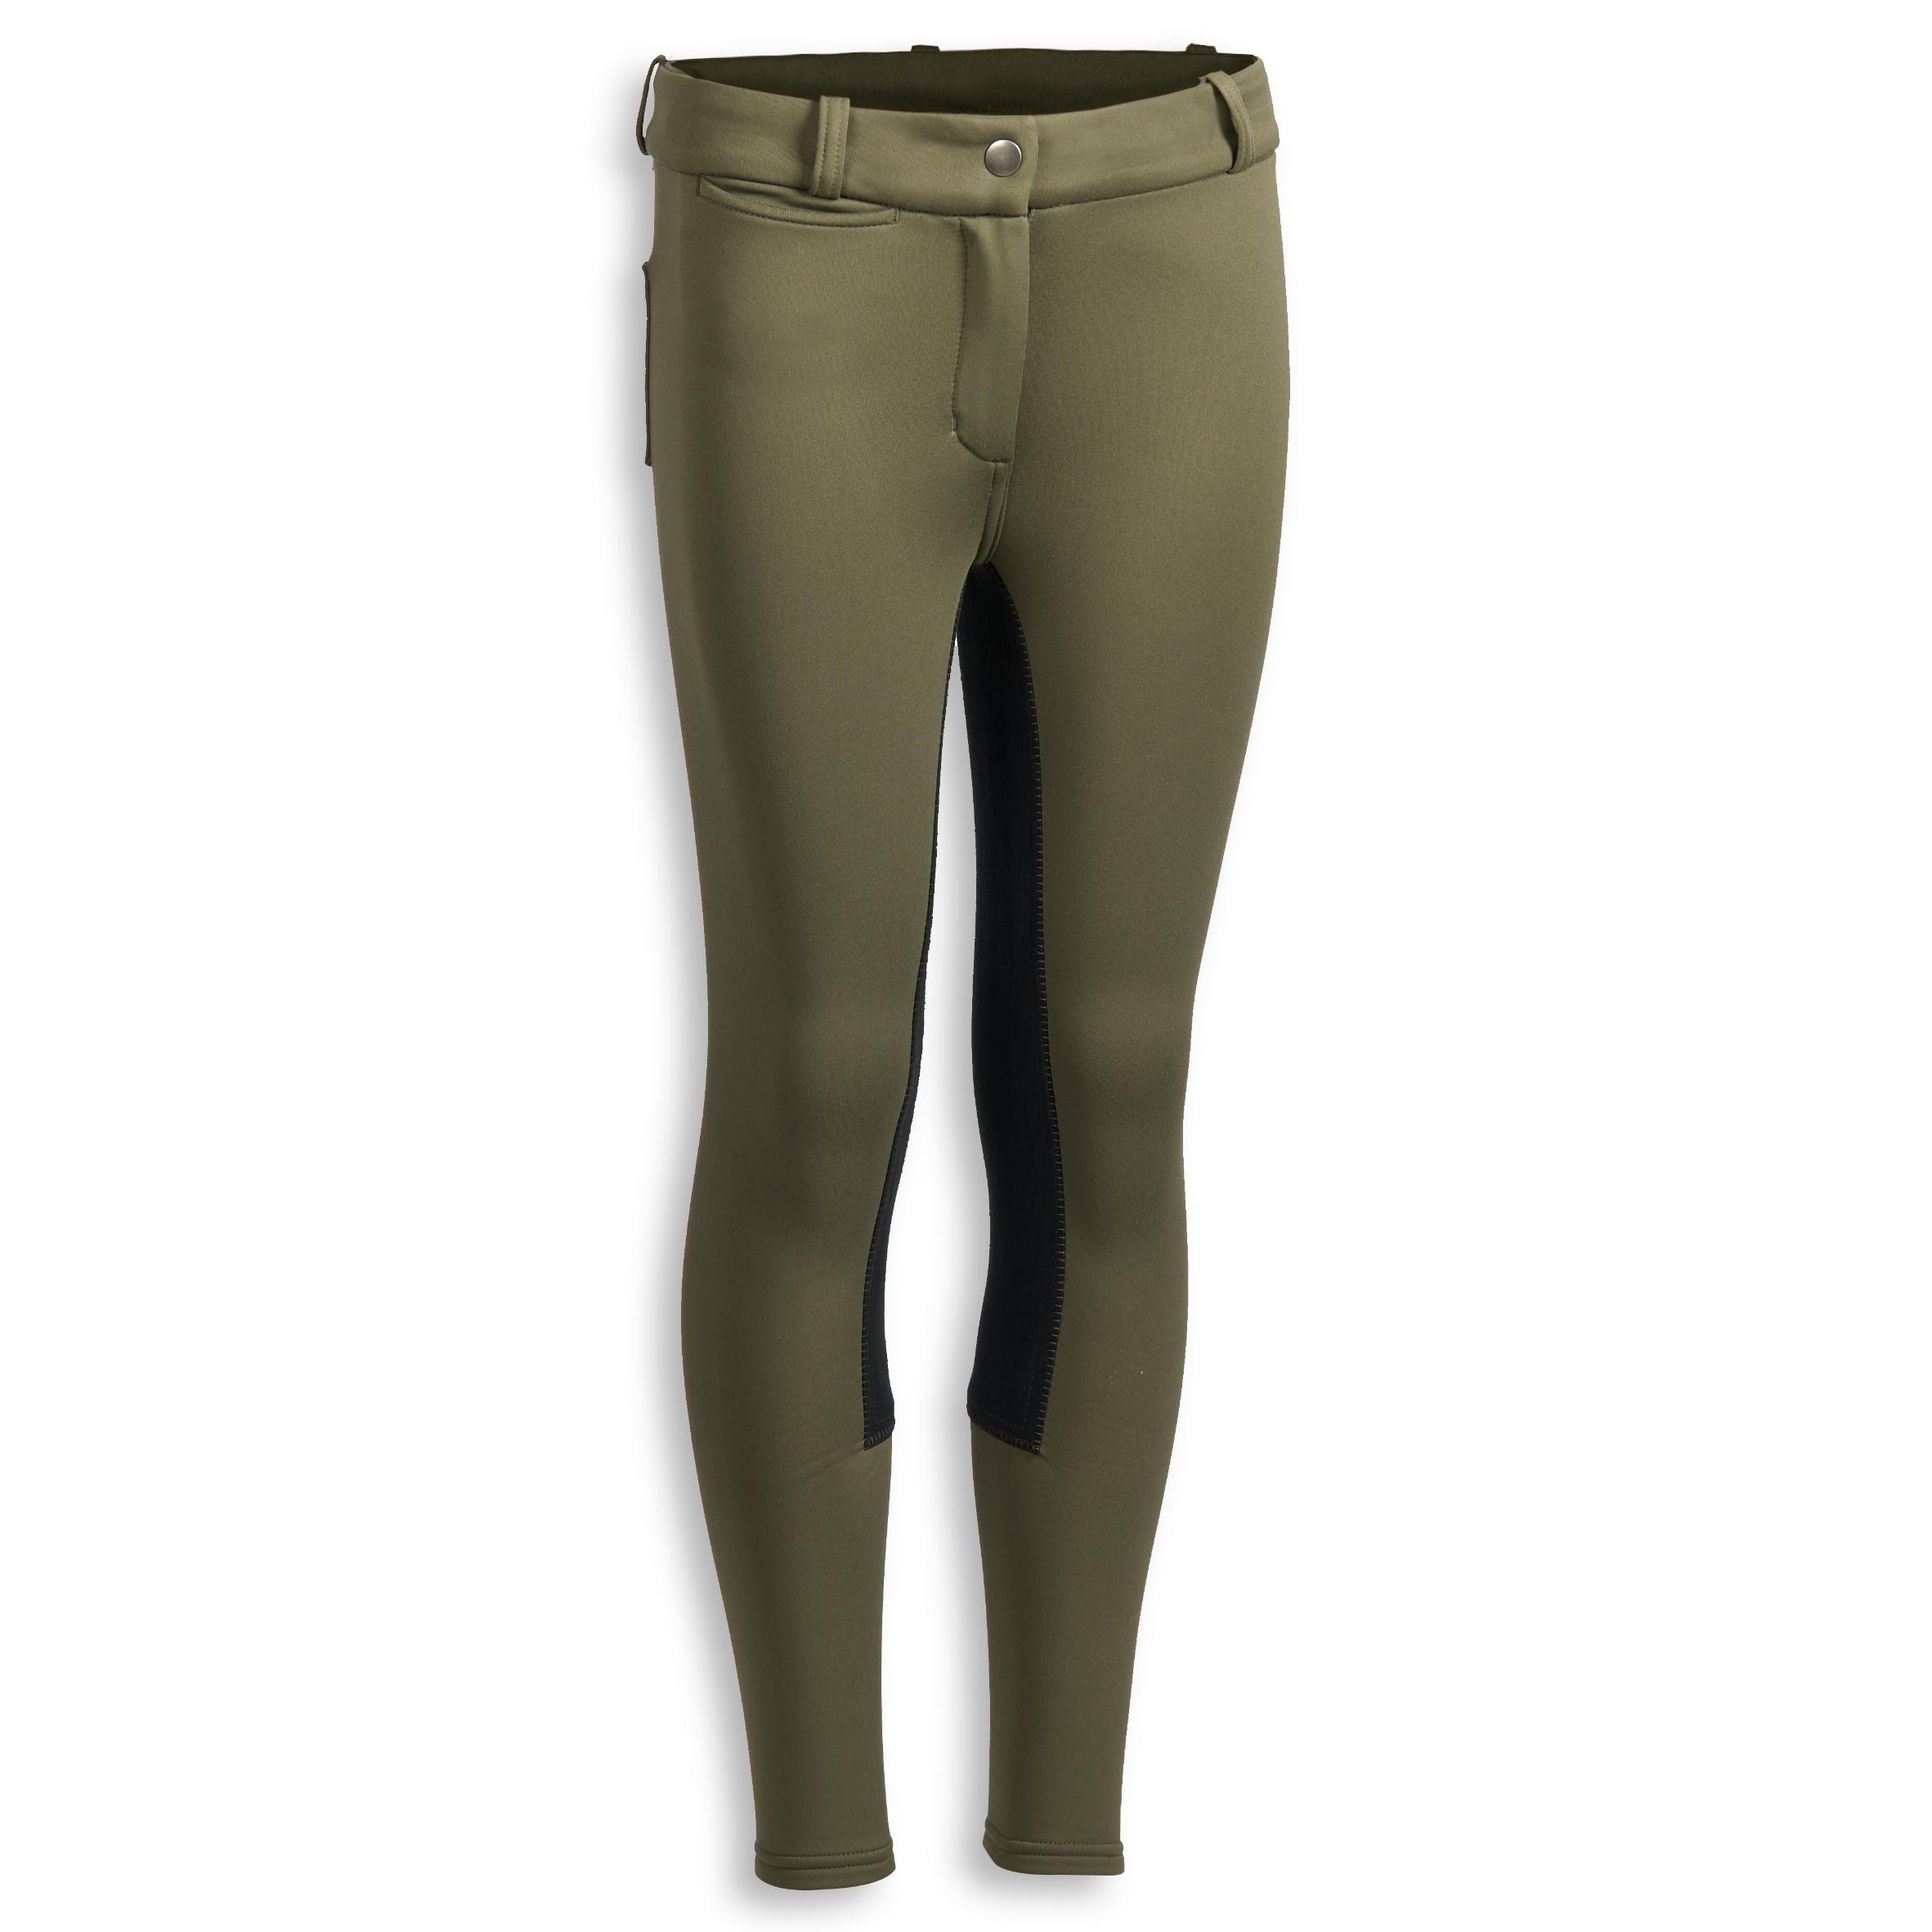 Pantalon călduros 180WARM kaki